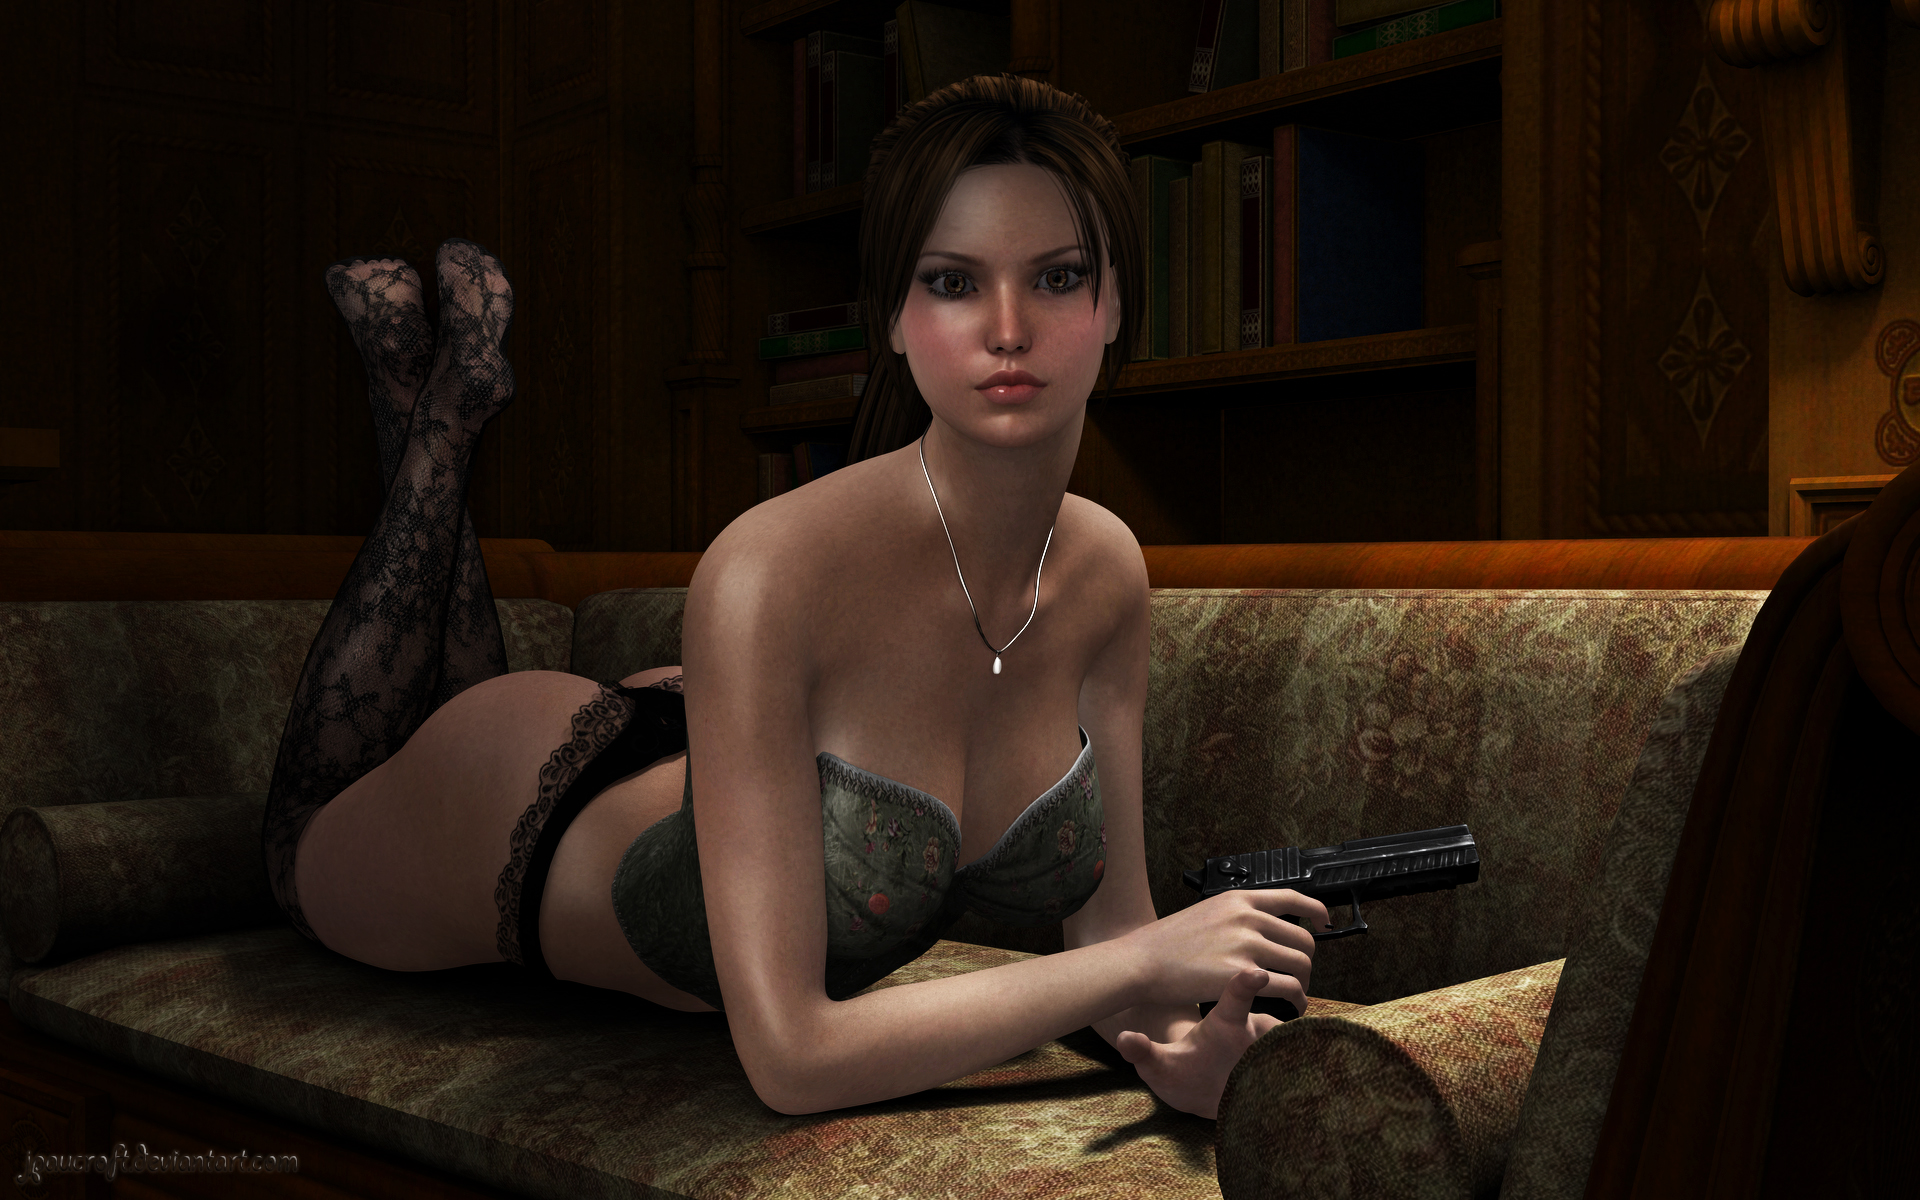 3d lara croft lingerie nsfw galleries